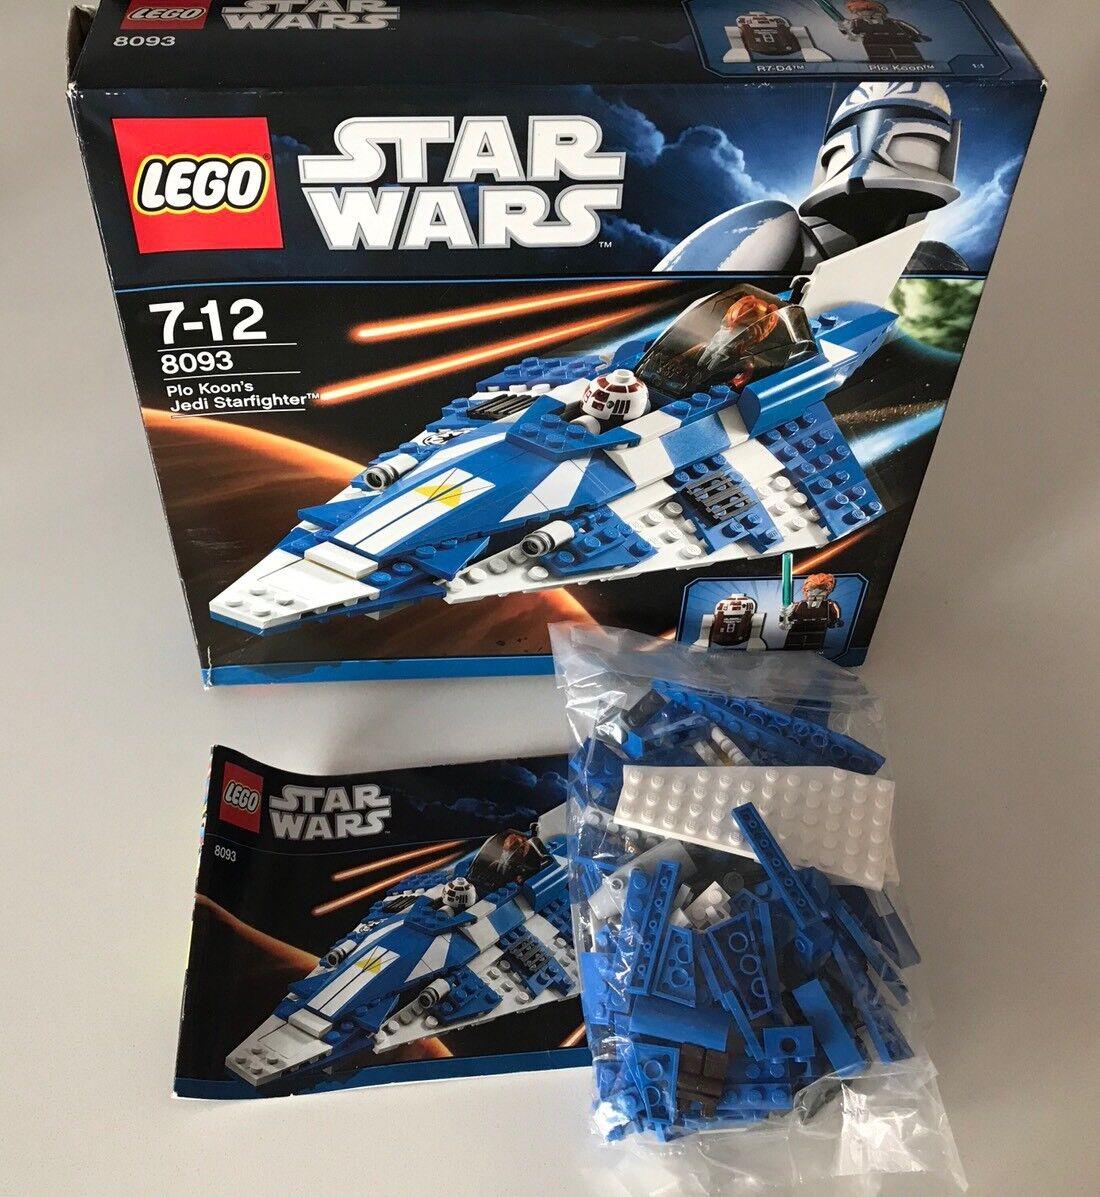 LEGO STAR WARS 8093 Plo Koon's Jedi Starfigher BA + OVP